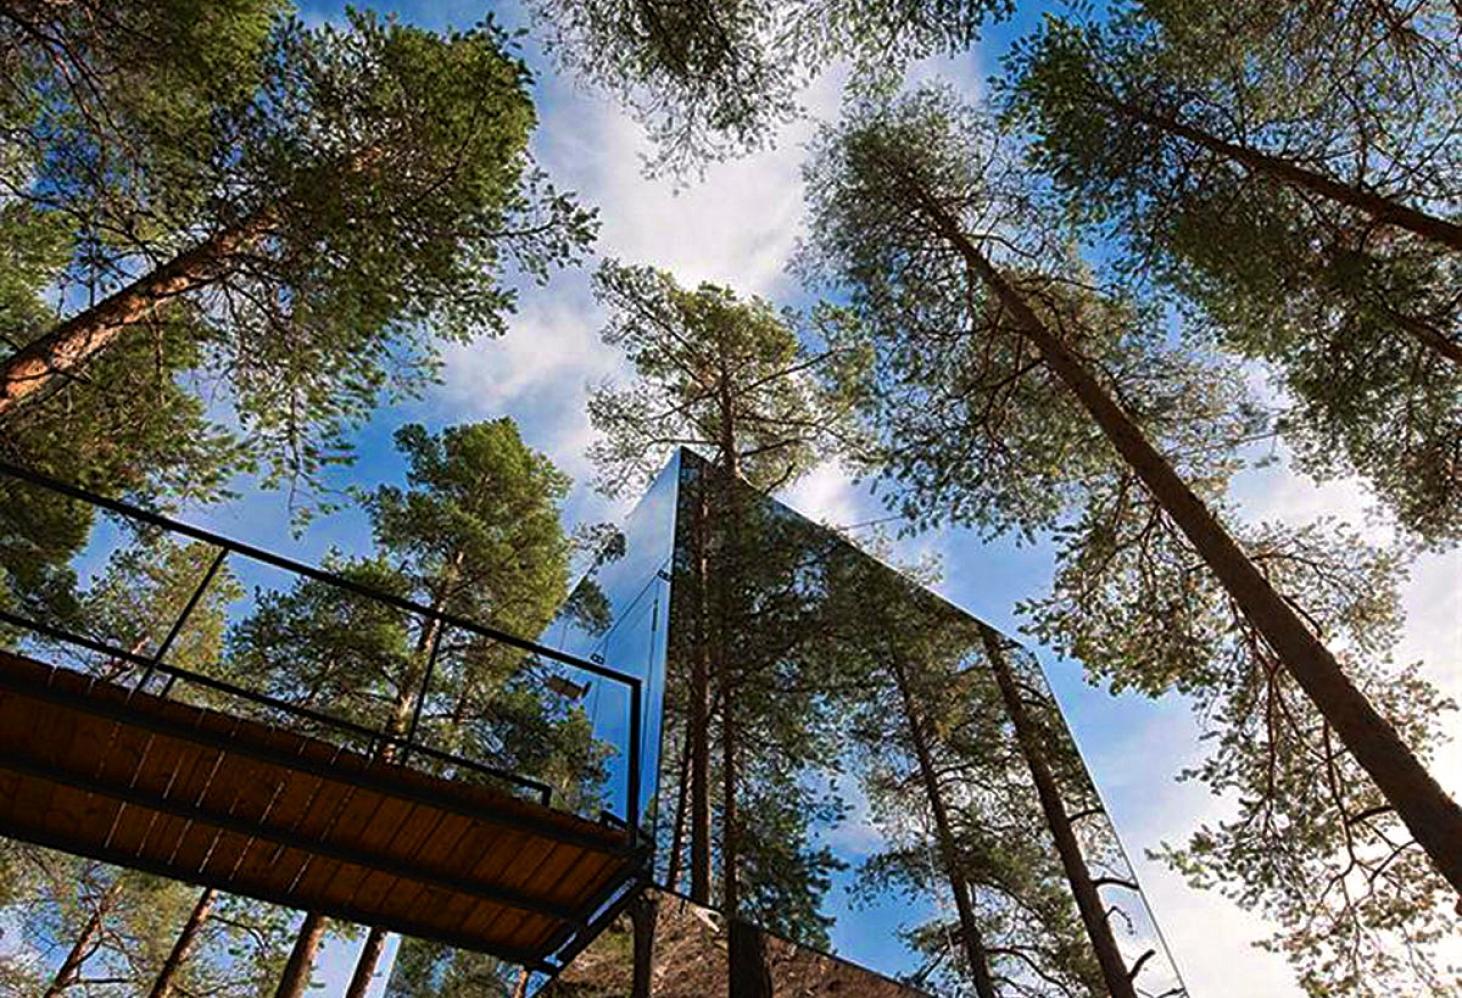 Tree Hotel ( TreeHotel ). Харадс. Северная Швеция. Отель на деревьях